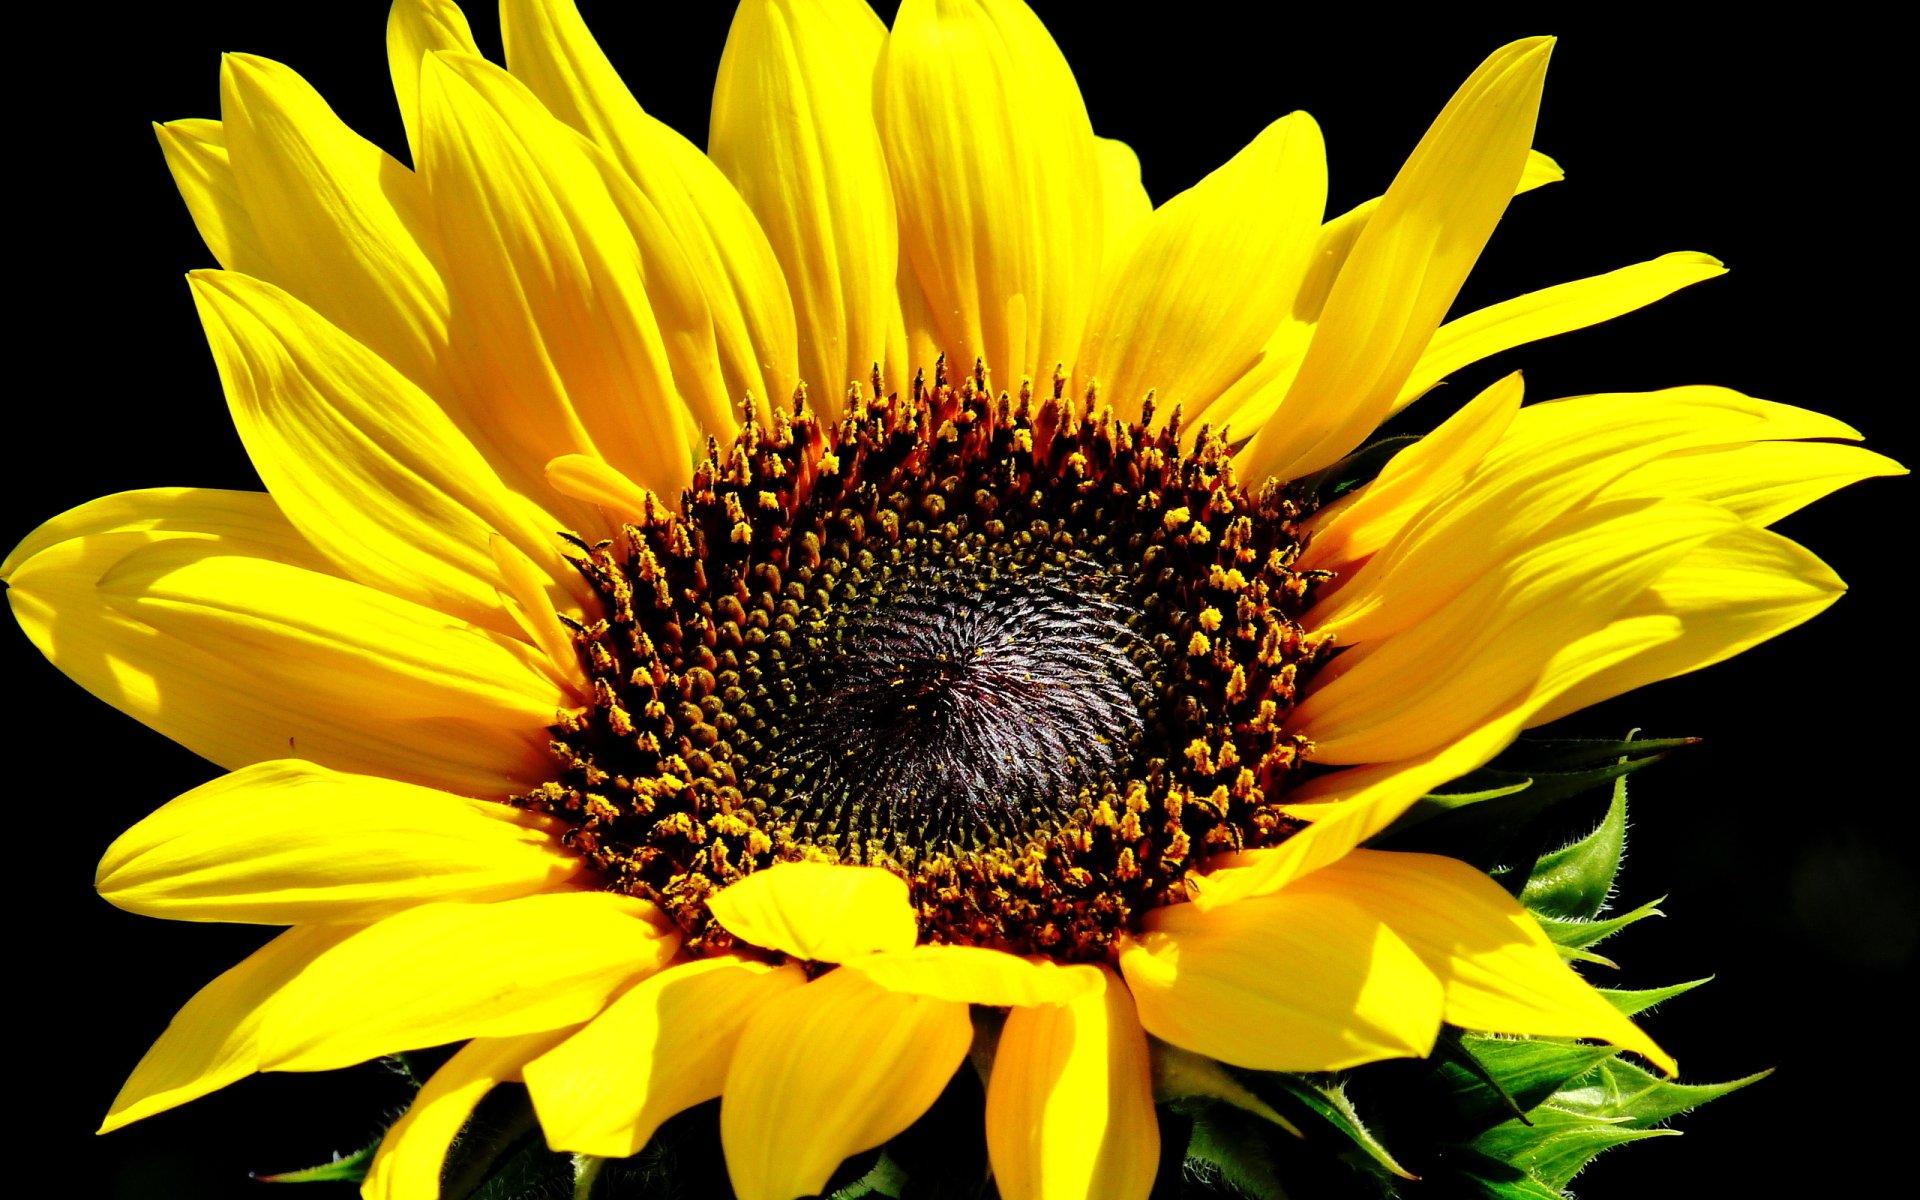 Sunflower HD Wallpaper | Background Image | 2560x1600 | ID ...